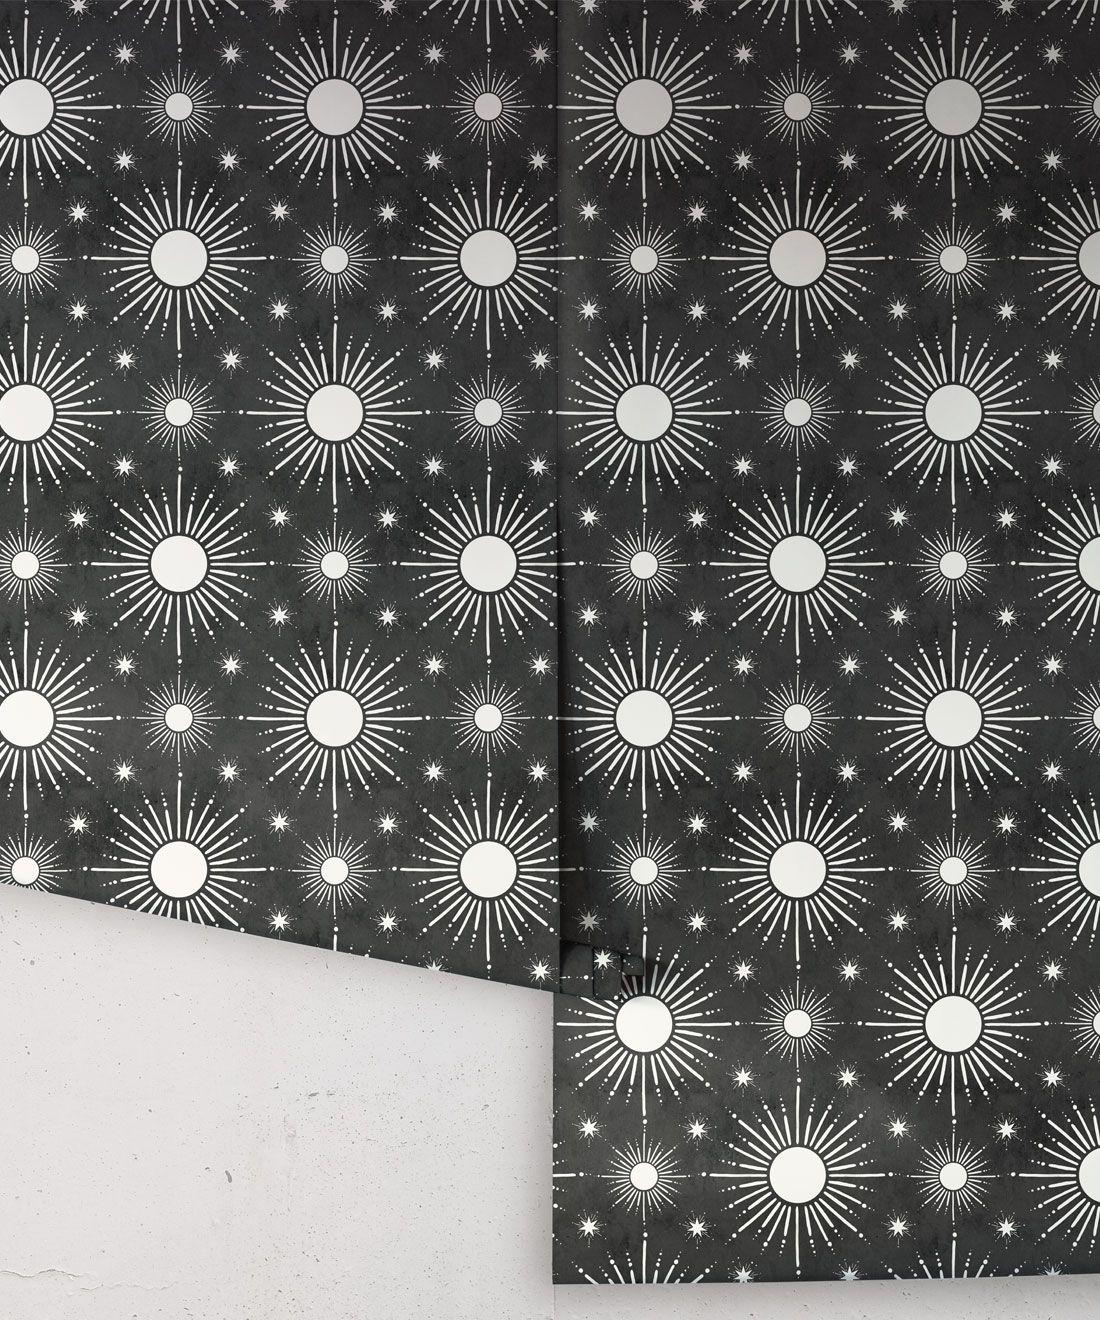 Sun Light Star Bright Wallpaper • Charcoal • rolls